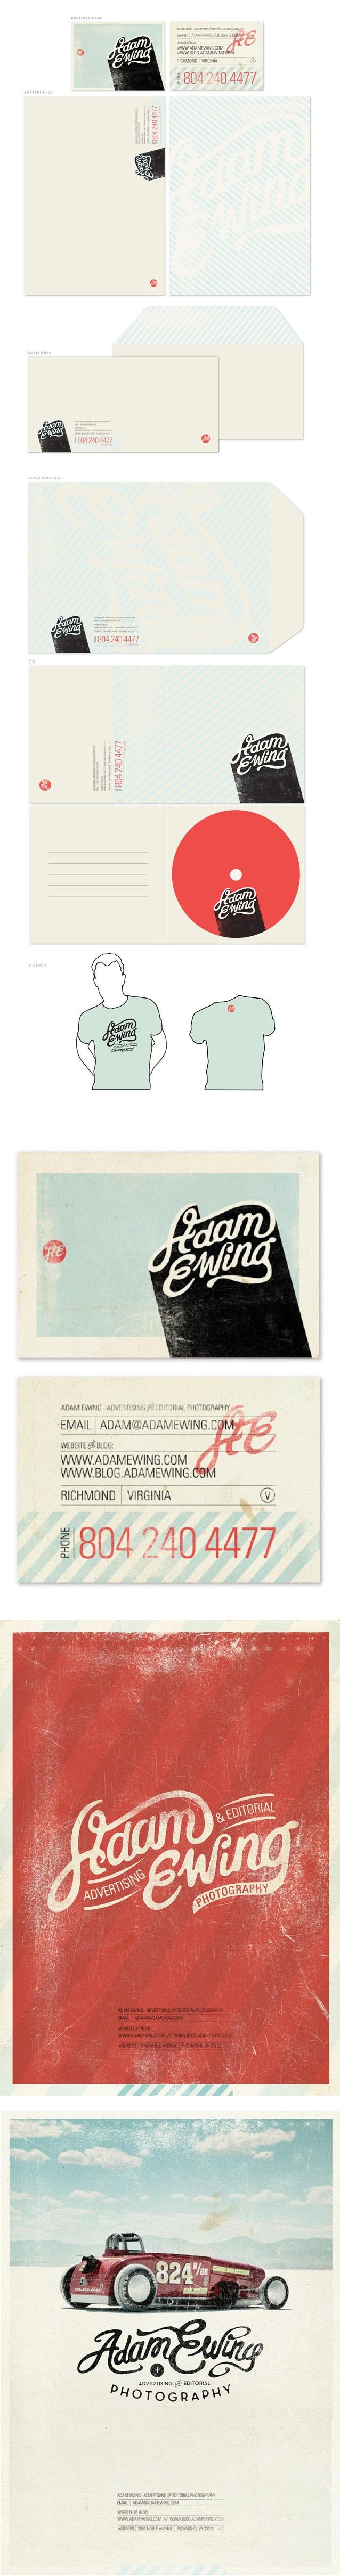 identity / Adam Ewing | Designer: Alex Ramon